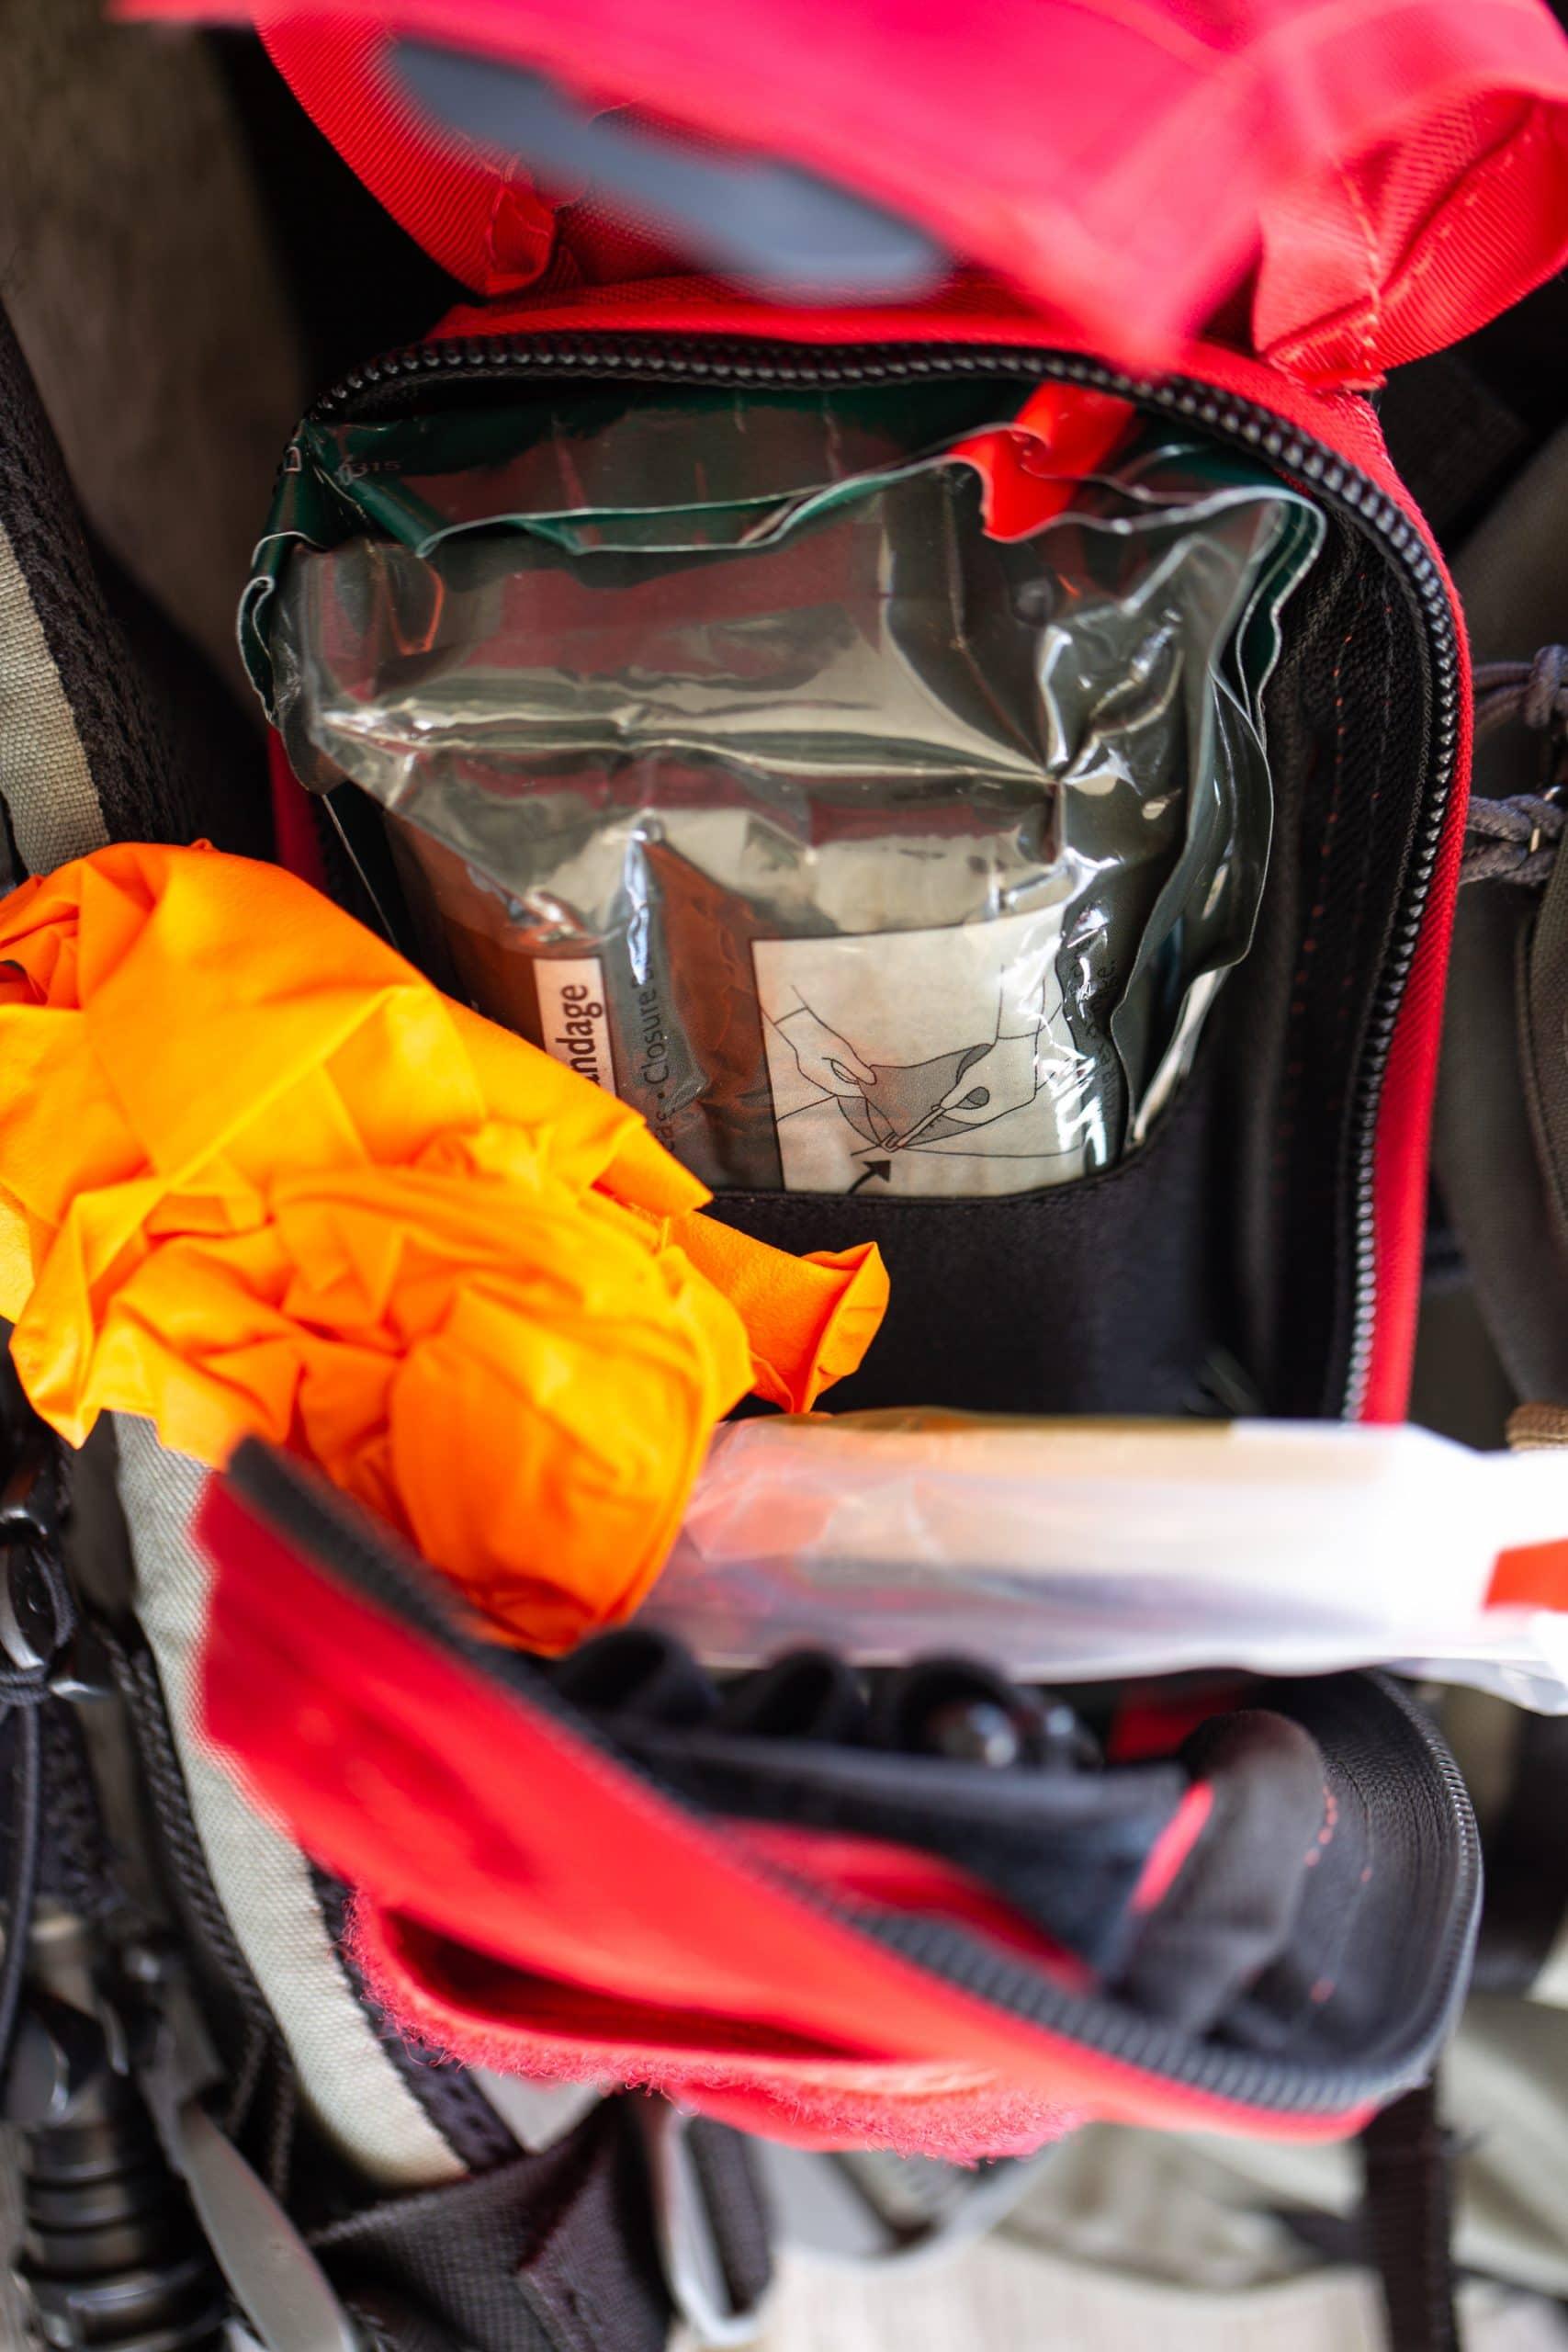 , Some IFAK Options – specifically Trauma Kits